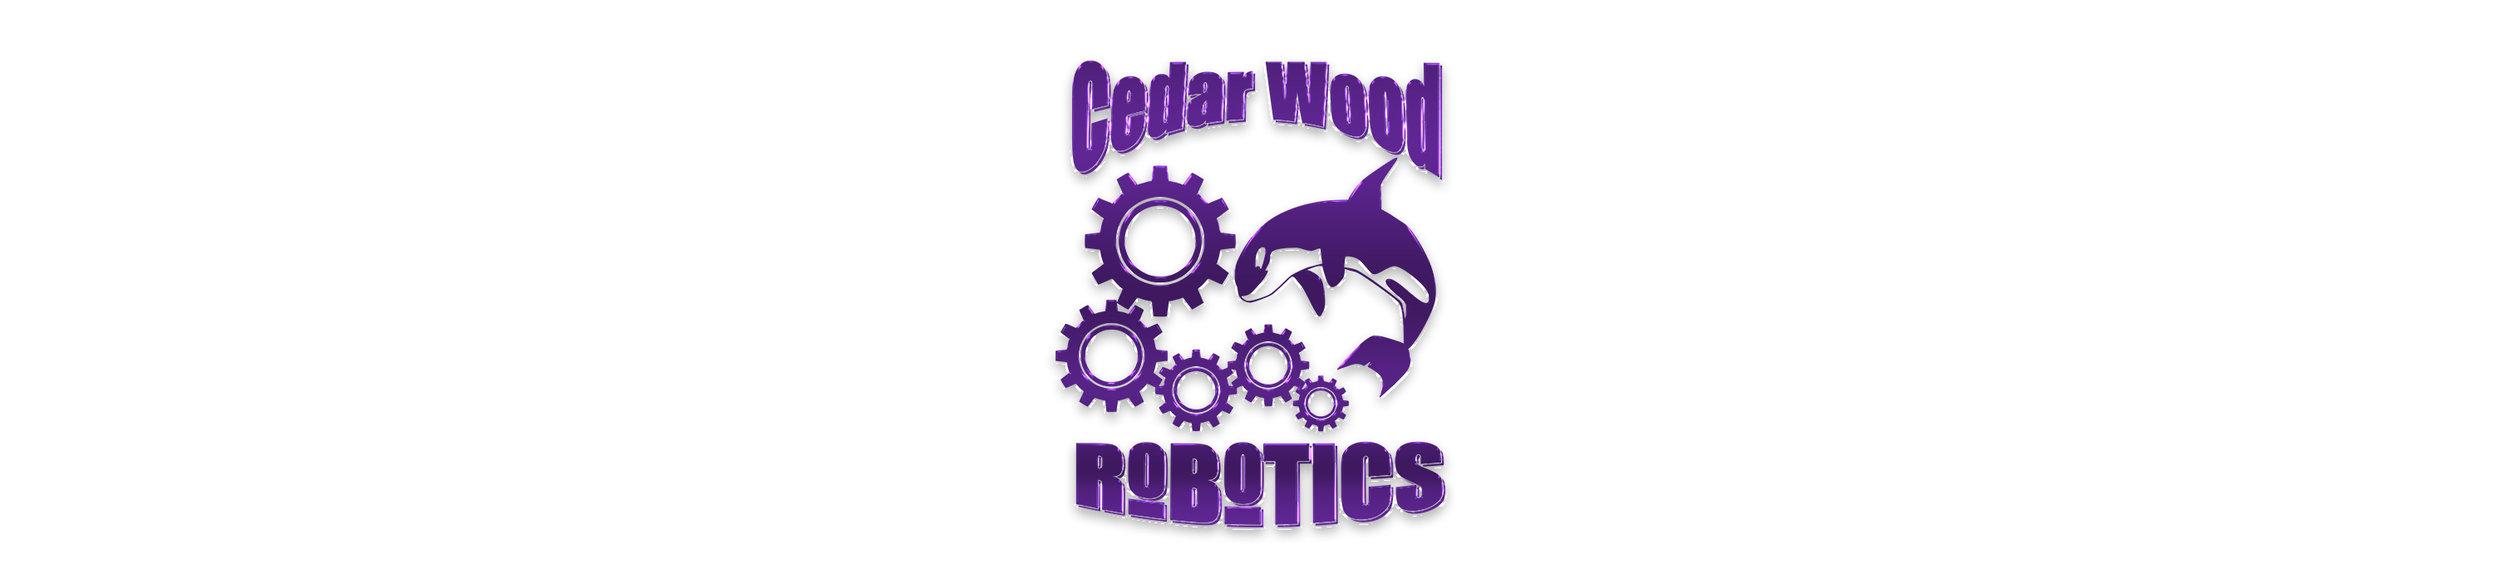 Cedarwood_Robotics.jpg